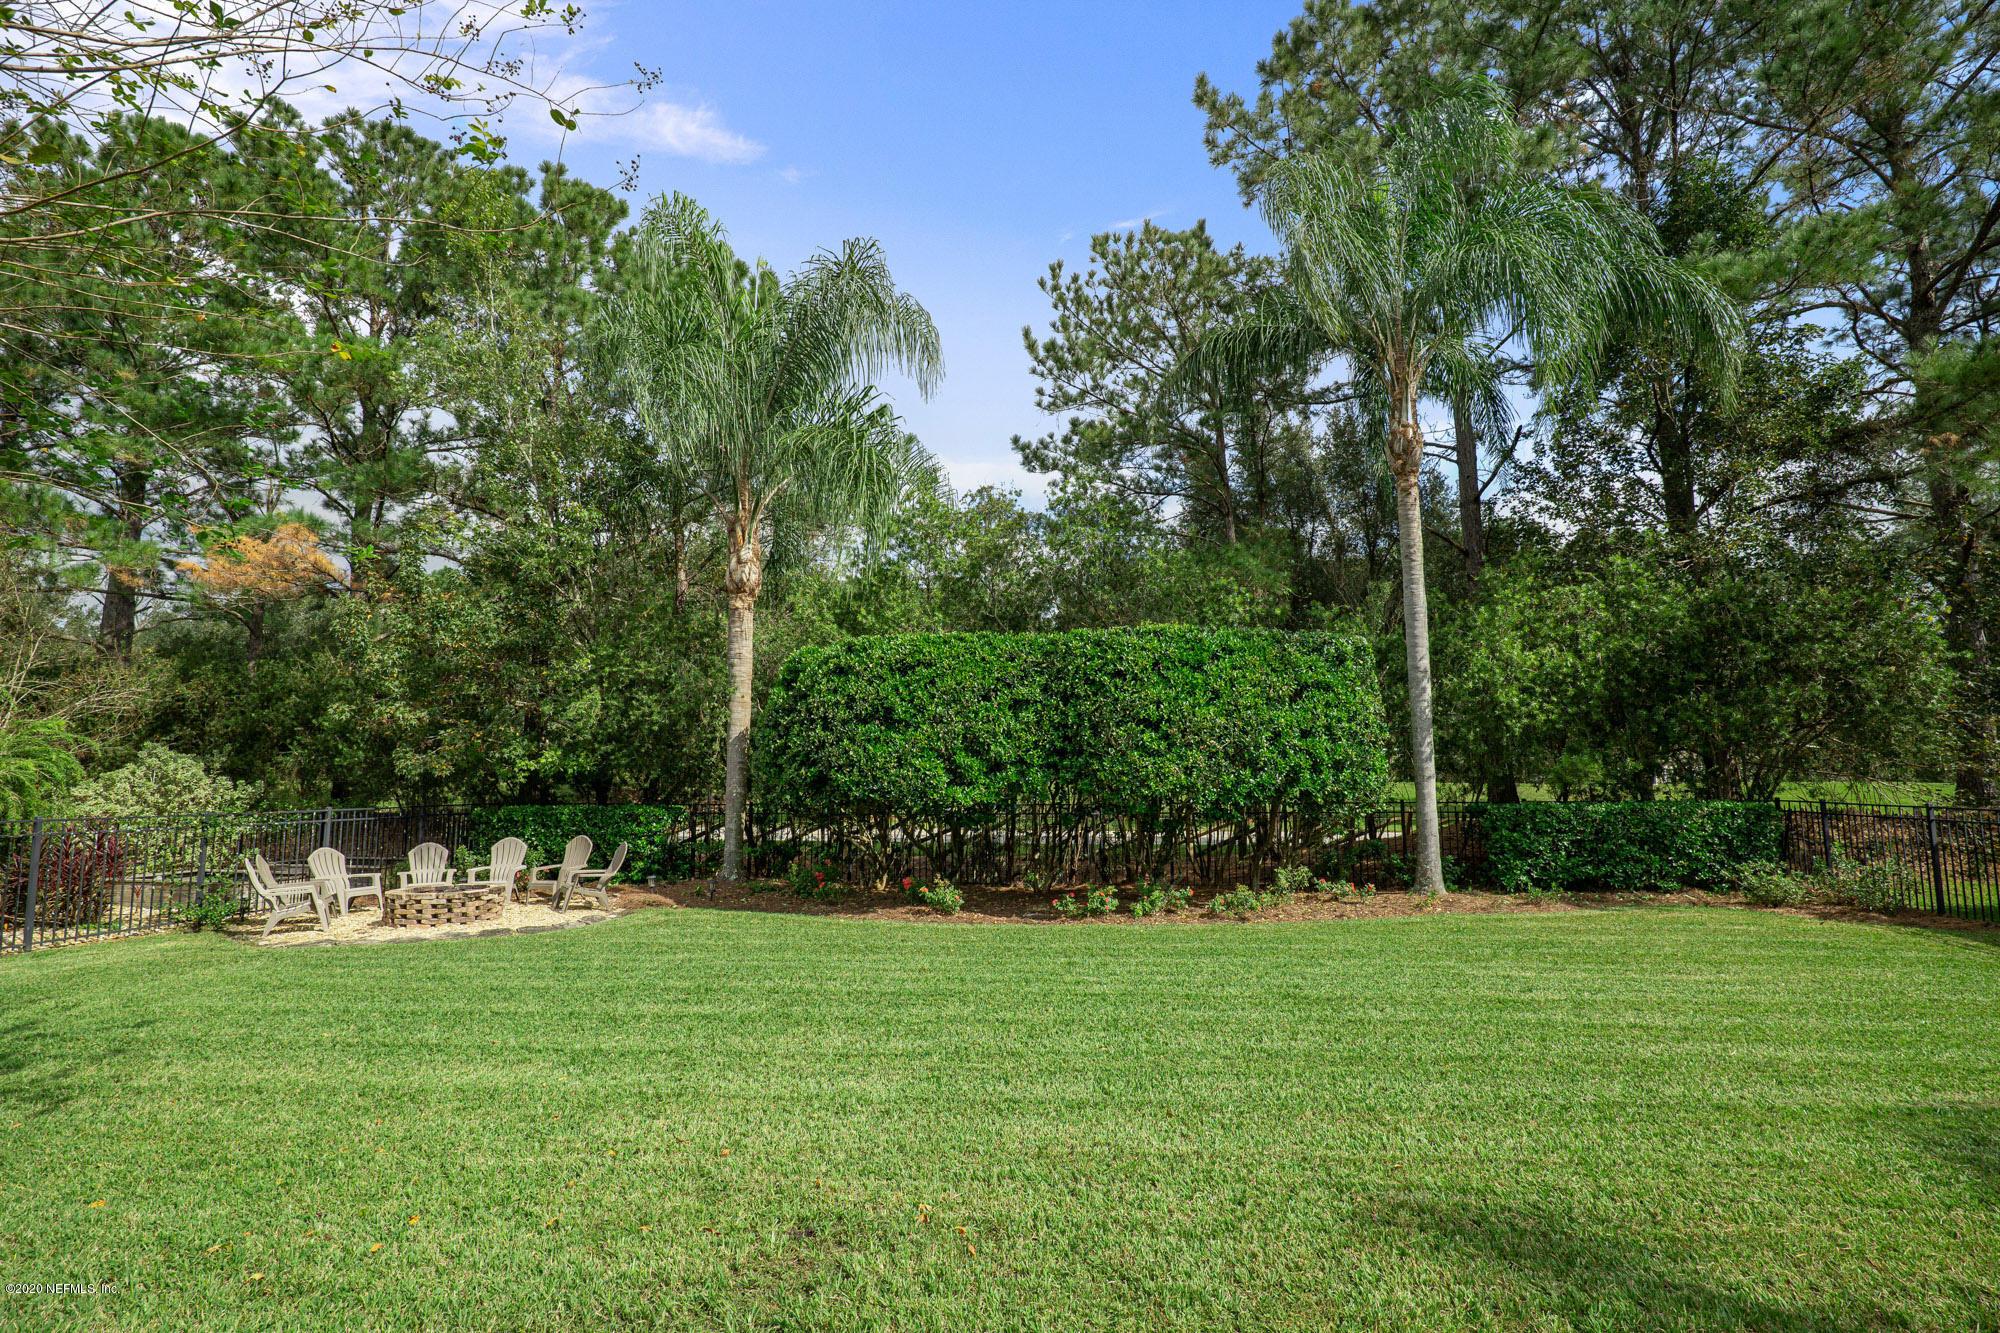 1720 COBBLESTONE, ST AUGUSTINE, FLORIDA 32092, 4 Bedrooms Bedrooms, ,4 BathroomsBathrooms,Residential,For sale,COBBLESTONE,1082570